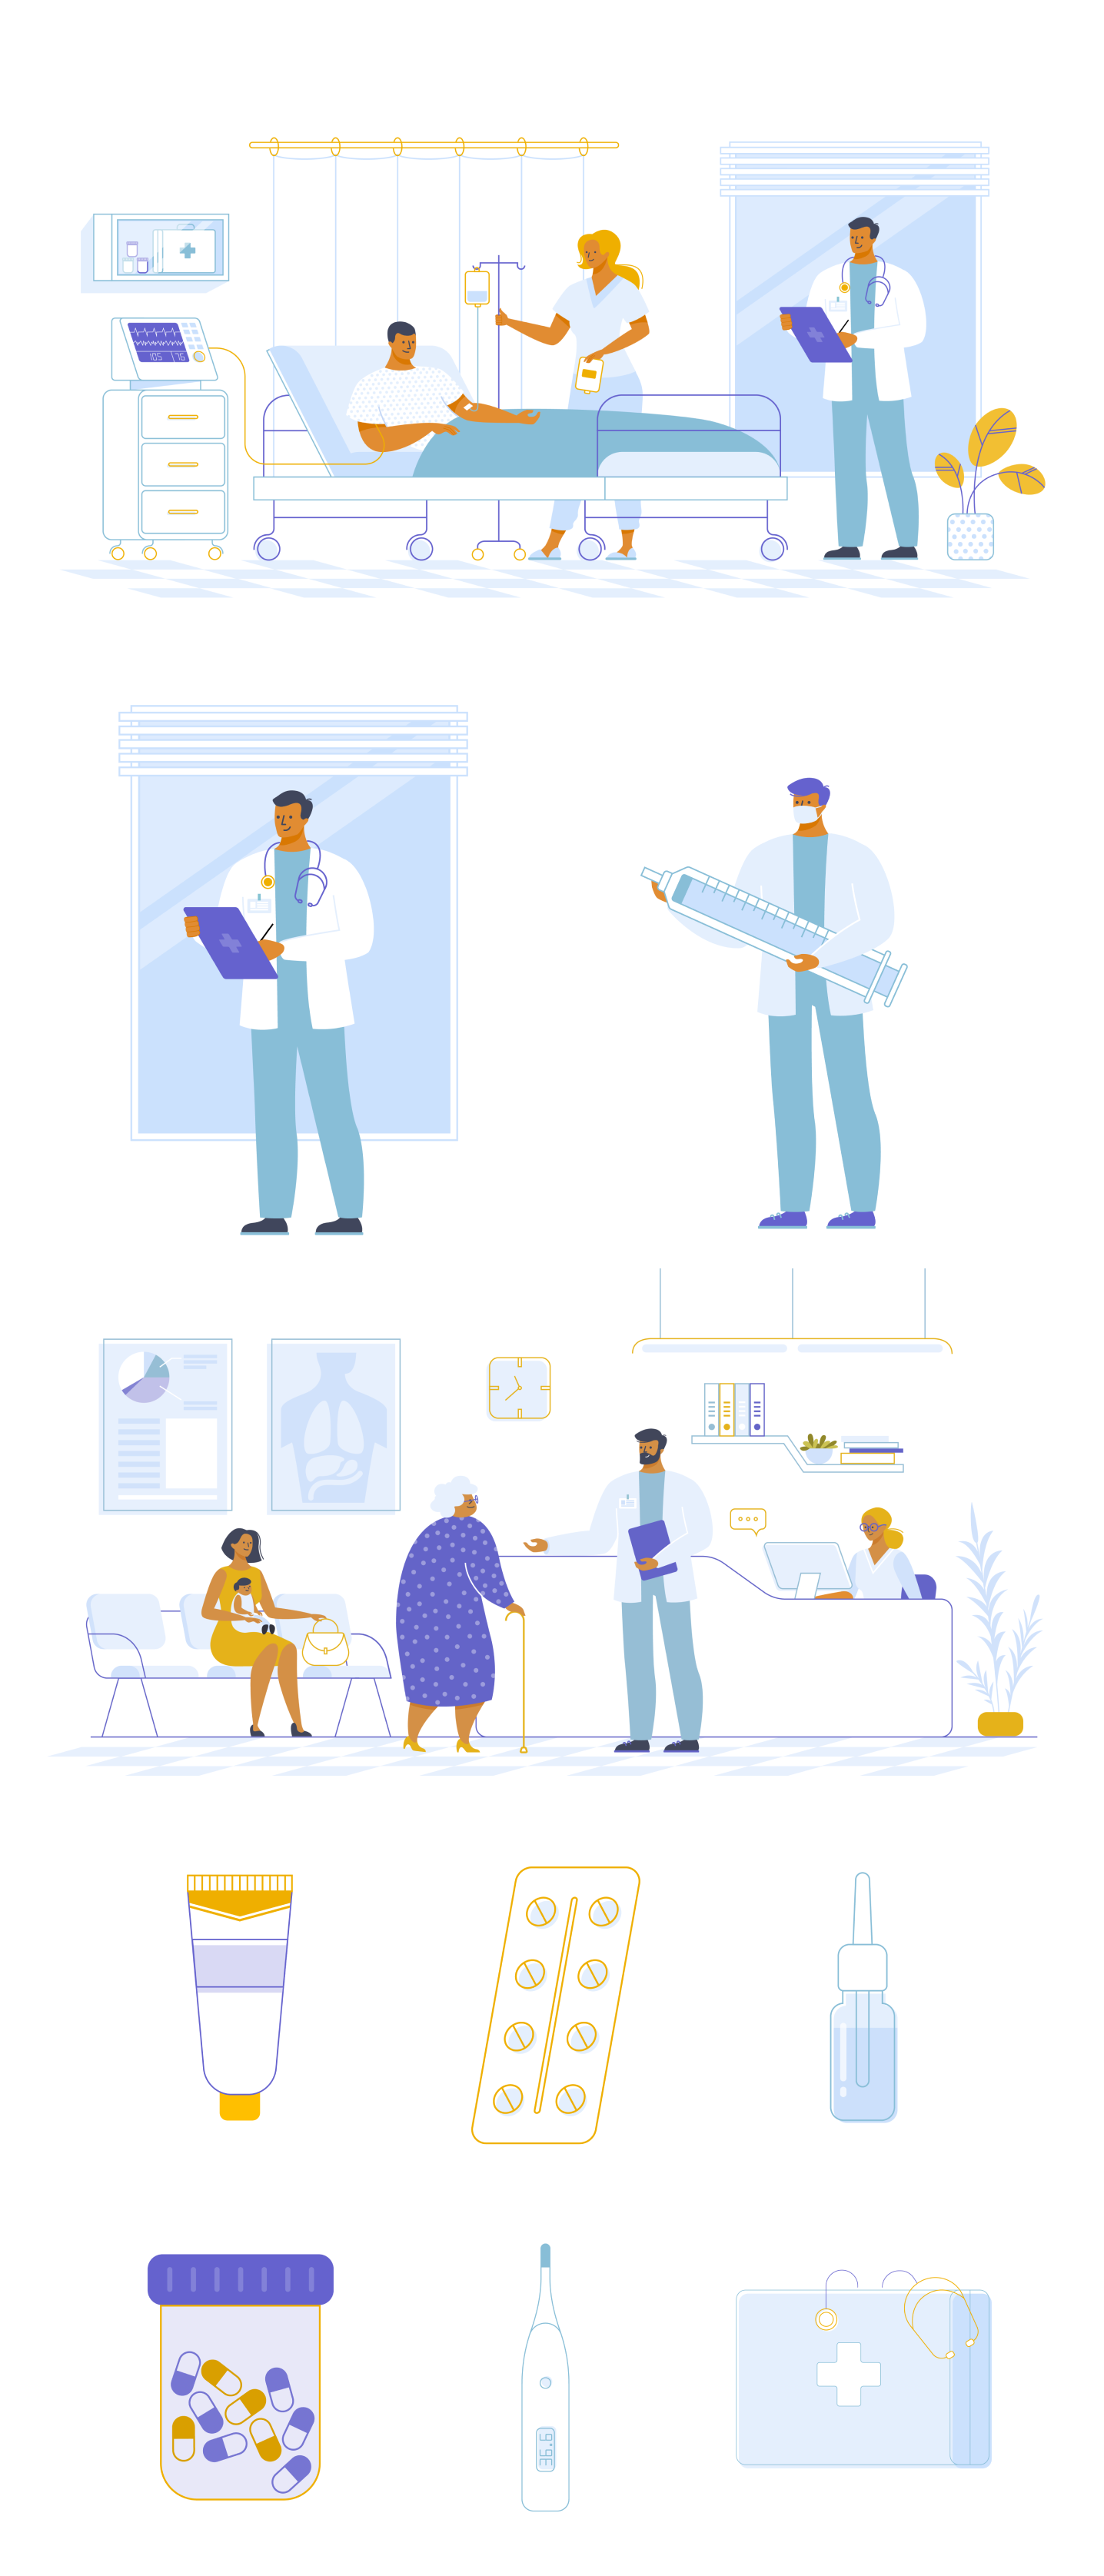 Free vector illustration of health workers, doctors, nurses, hospital, medicine, patient, hospital ward, syringe, tablets, medical, nurses, female doctor, mask, covid, vaccine, health, serum, thermometer, baby, mother